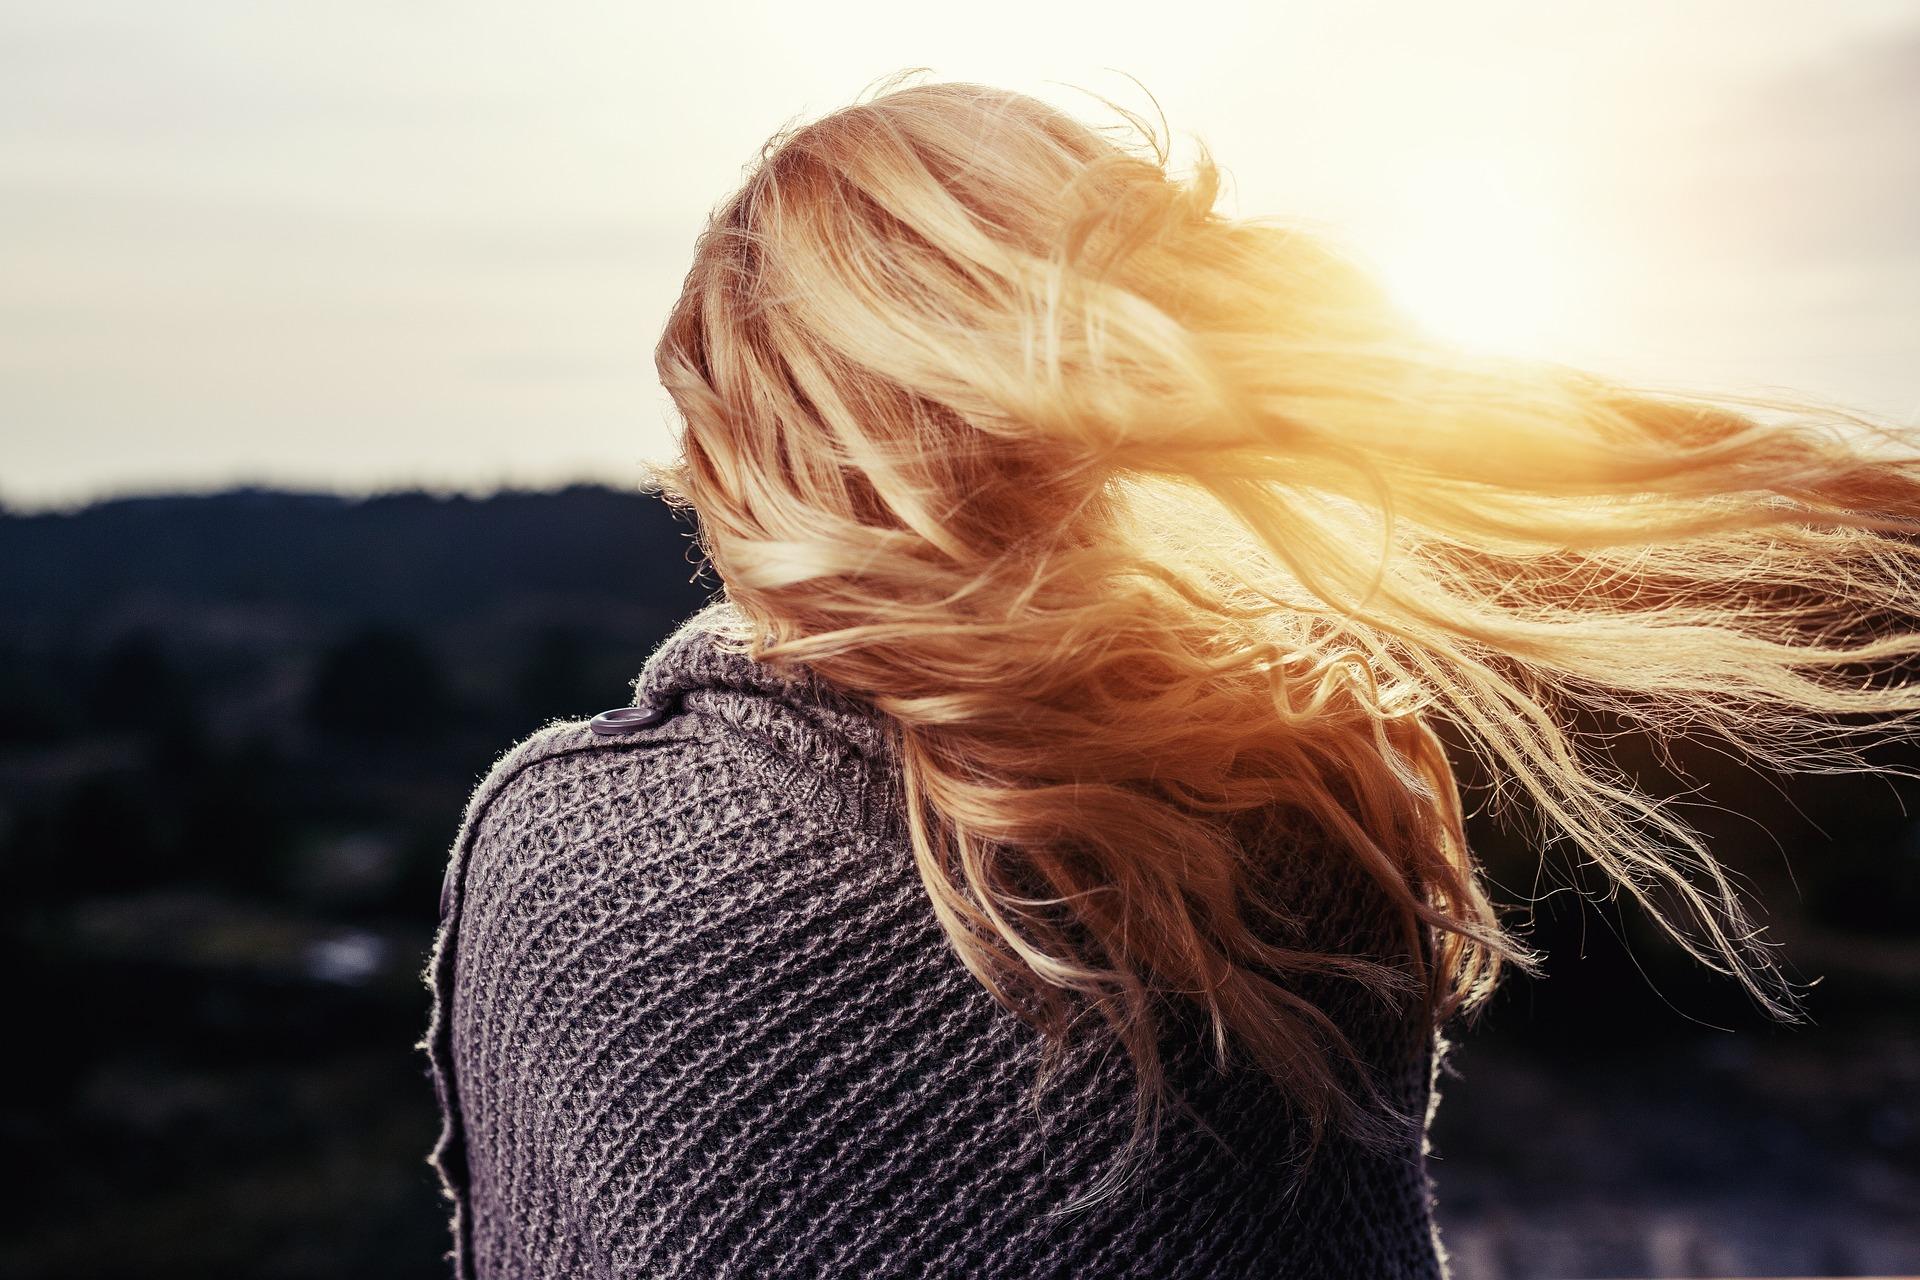 Rimedi naturali per la caduta dei capelli